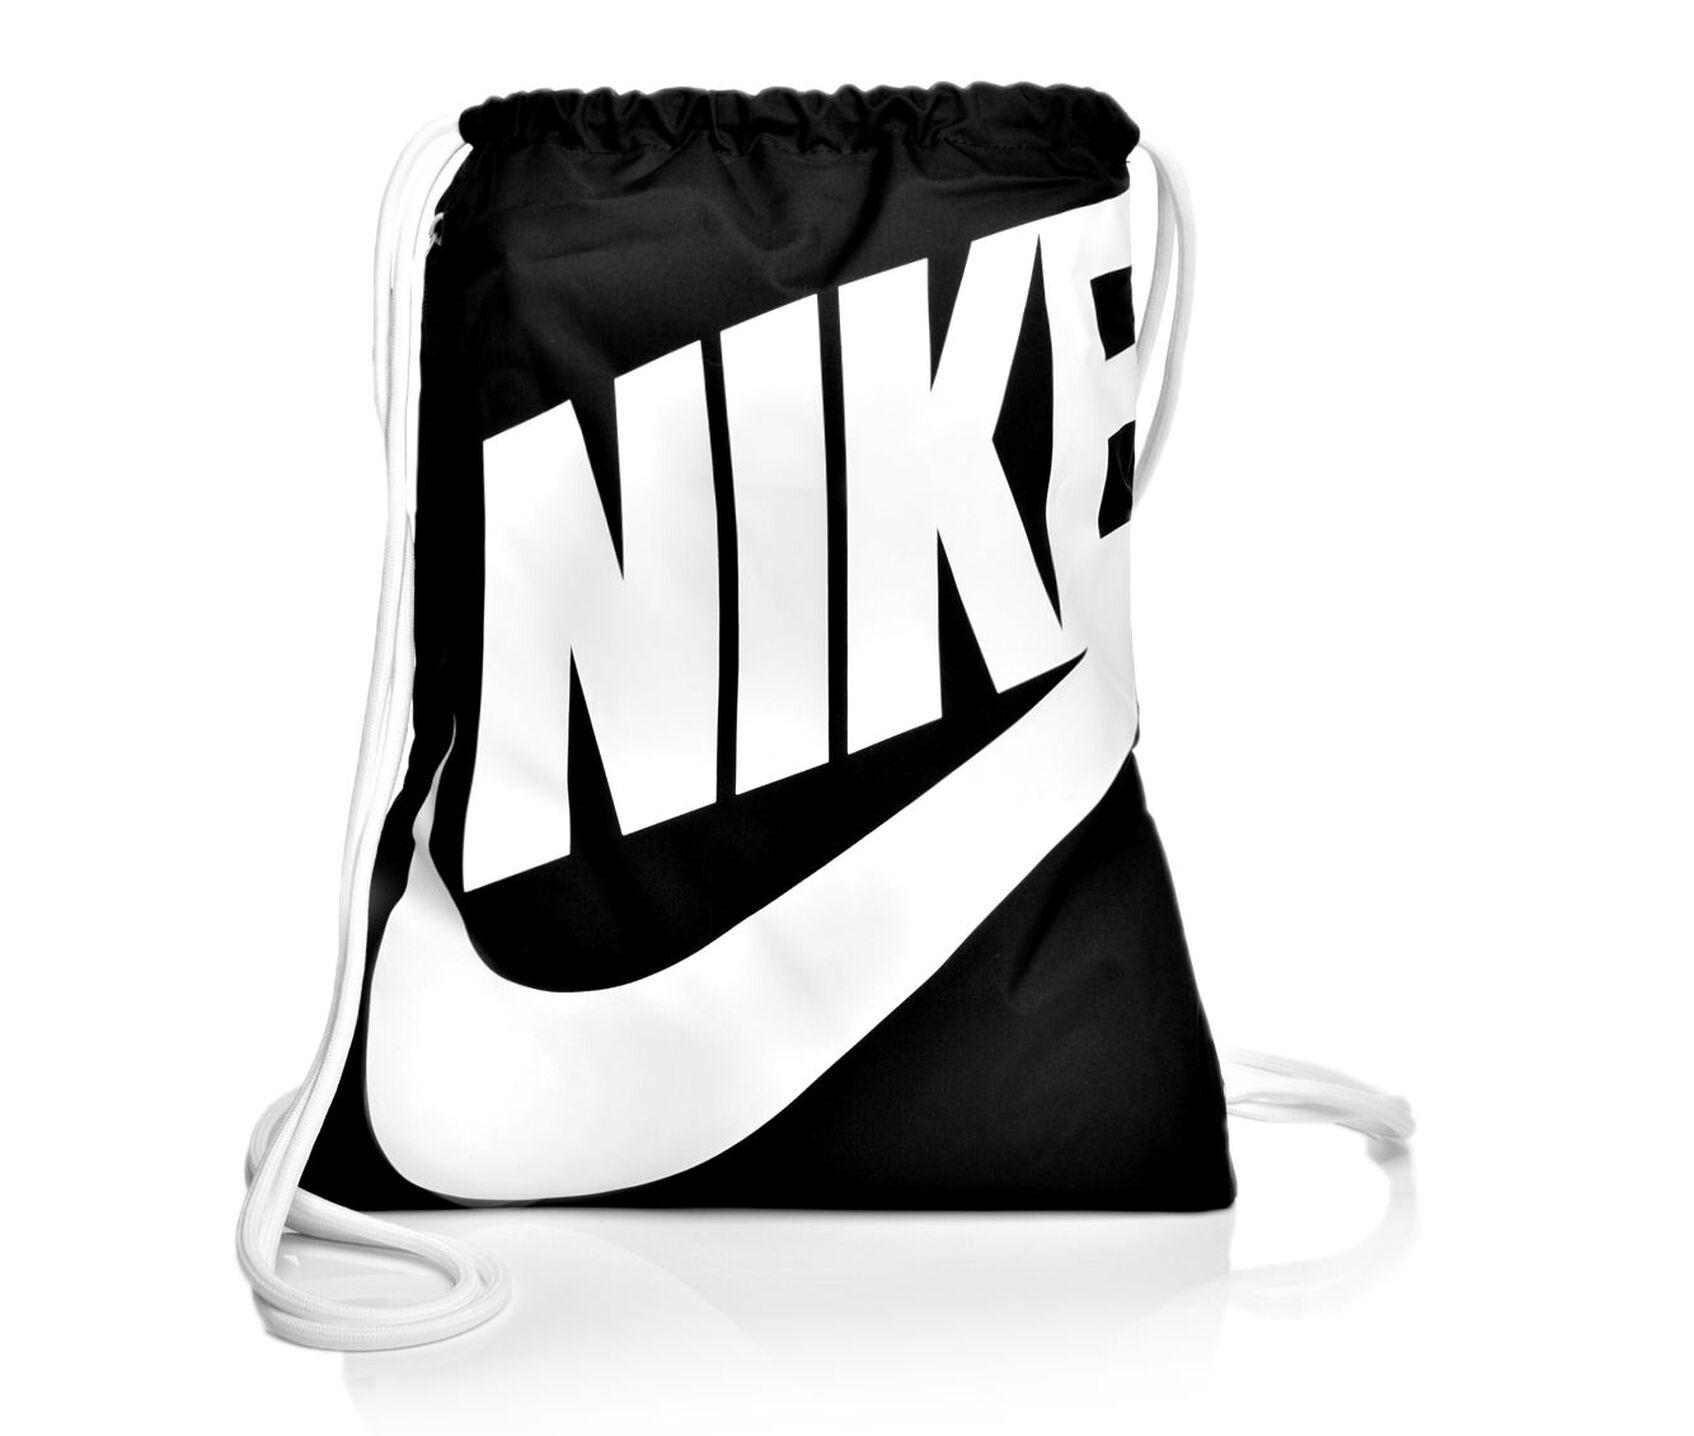 c587fd4b86ec Nike Heritage Gymsack. Previous